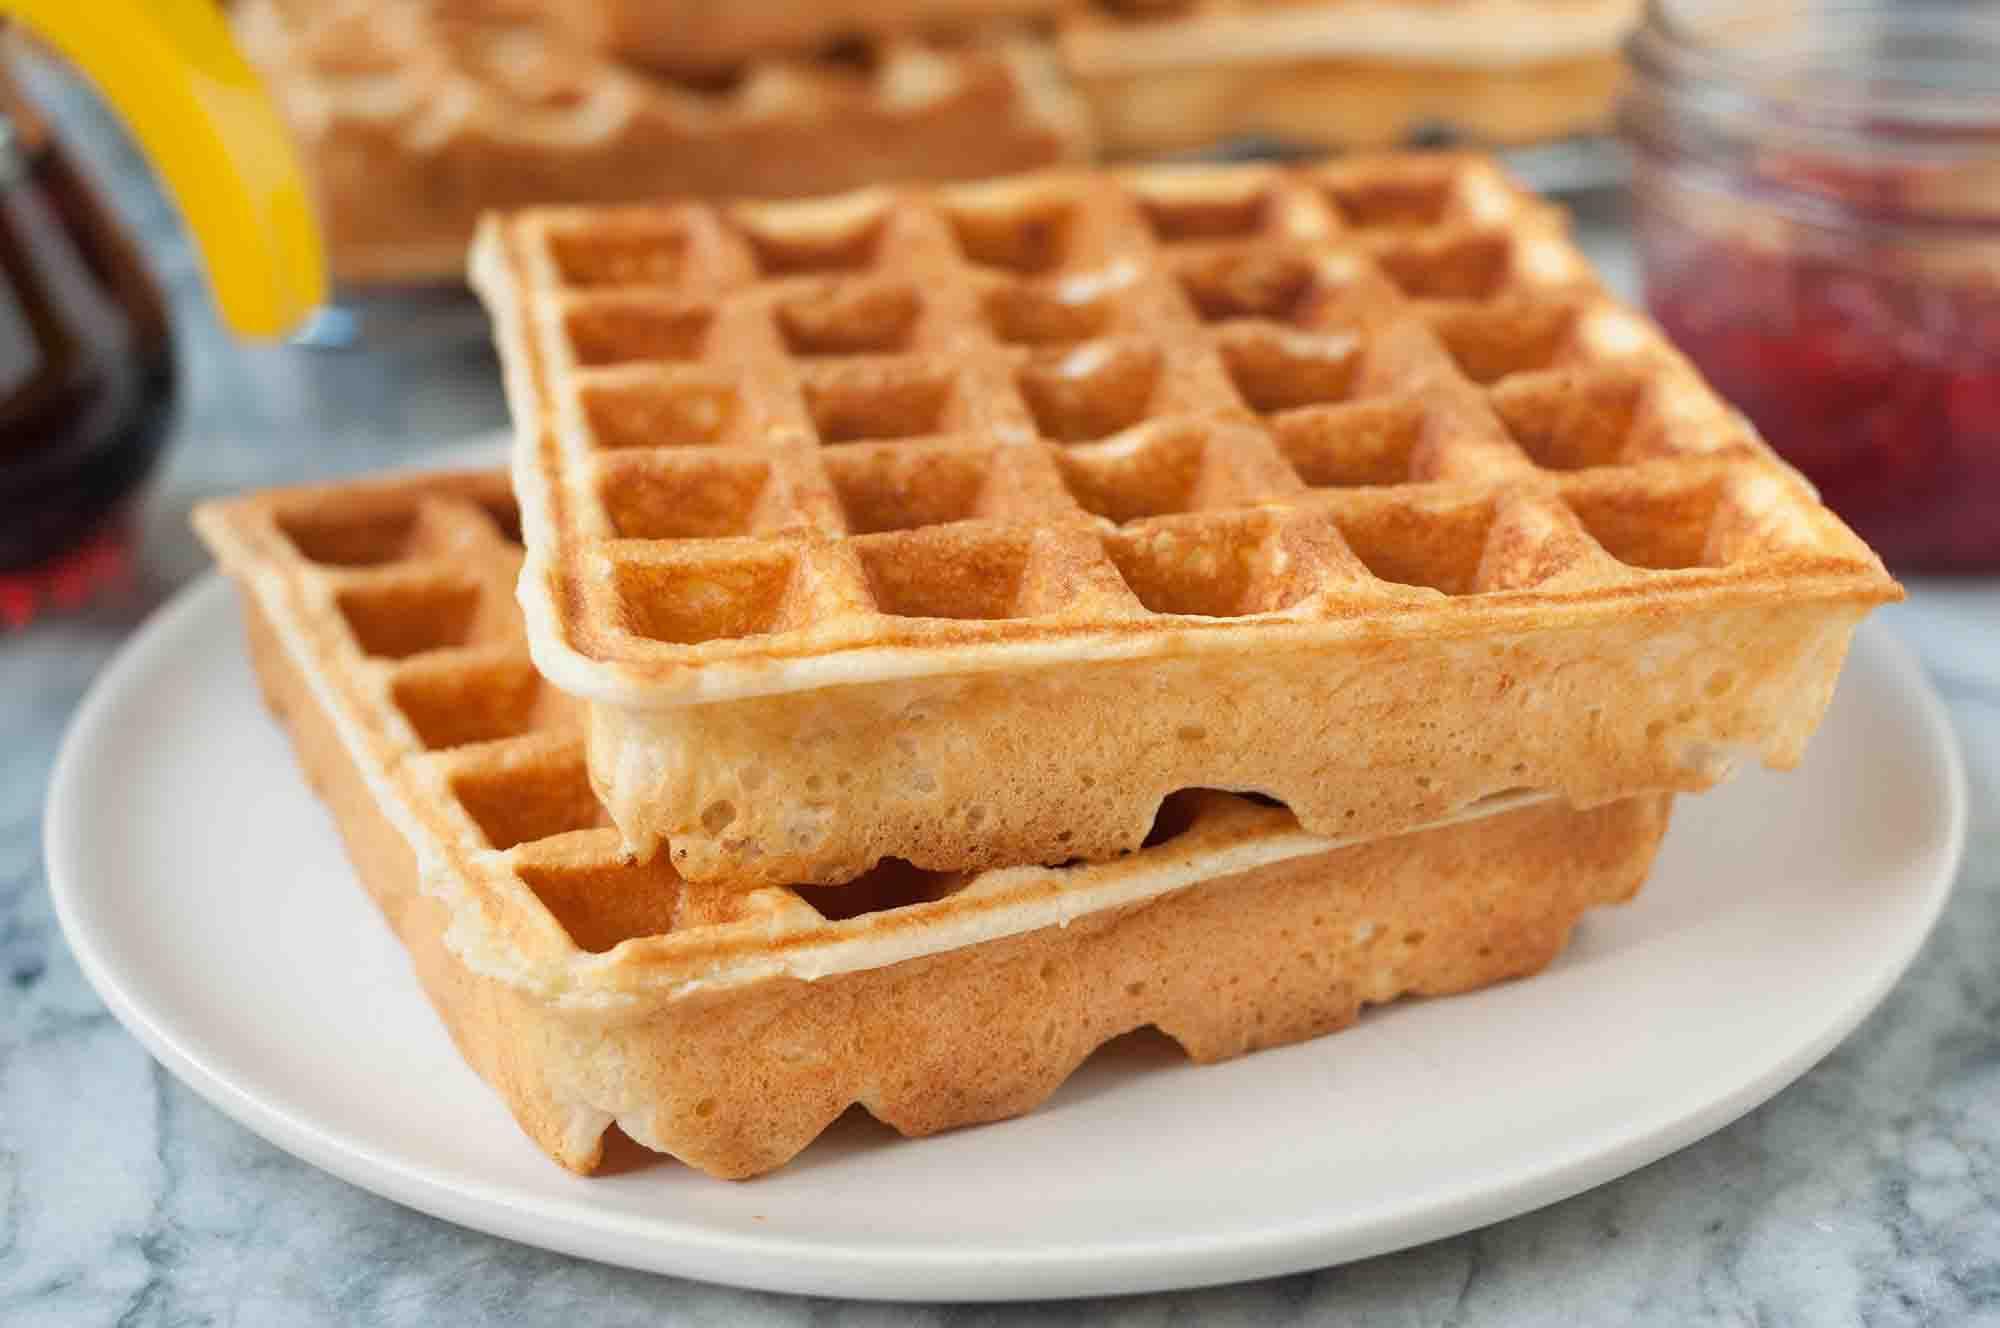 Two Crispy Waffles make from Buttermilk Waffle Recipe